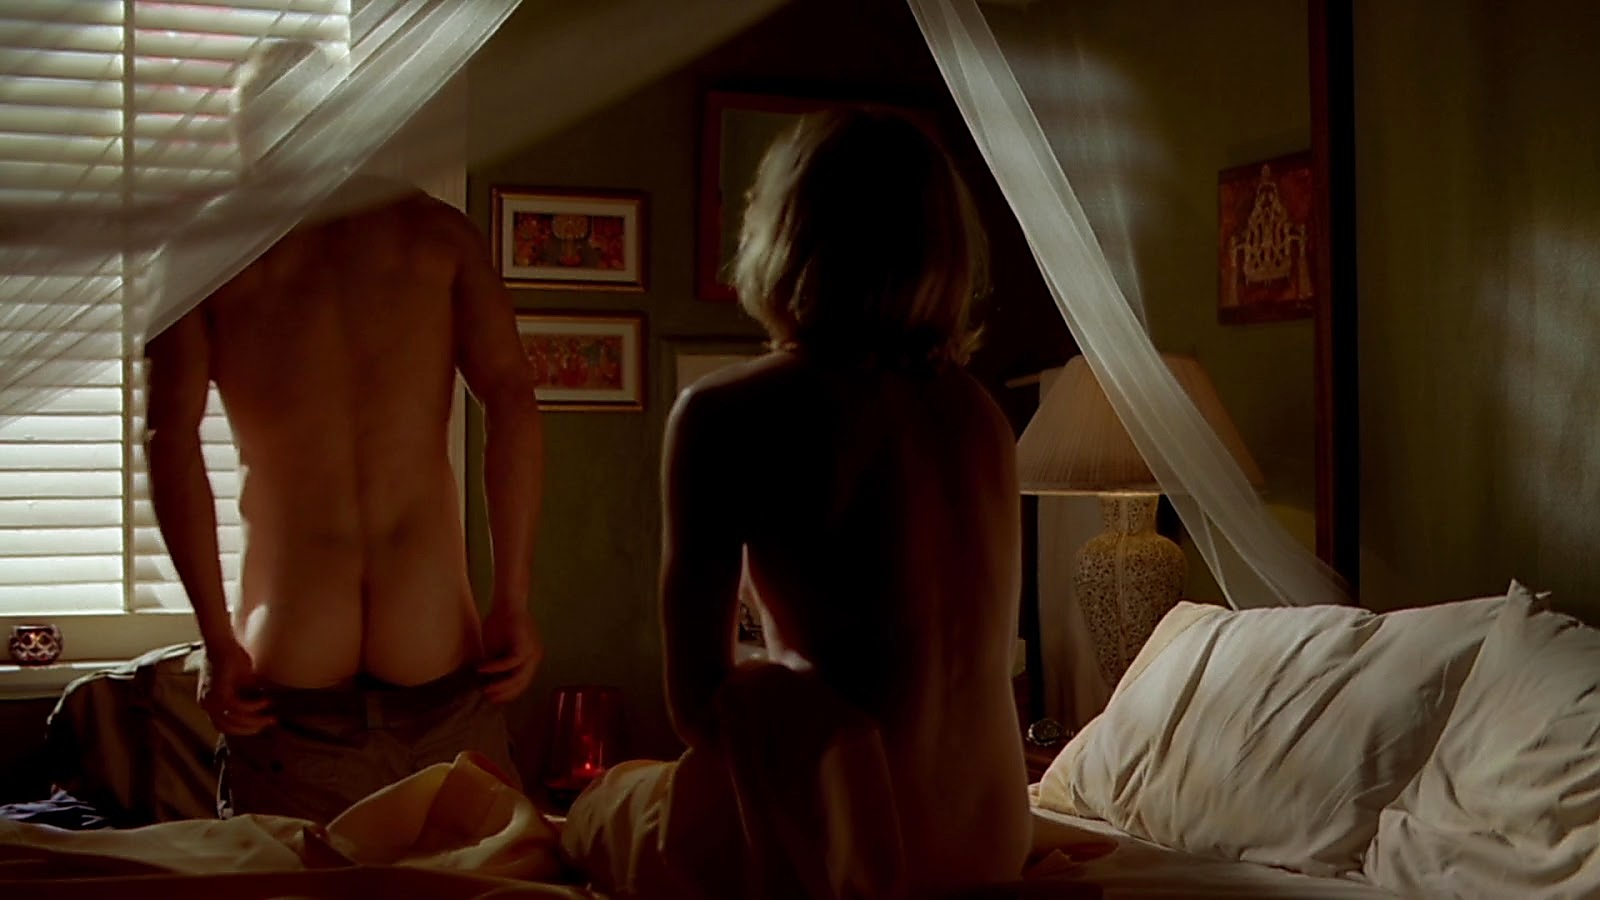 Philip Winchester sexy shirtless scene February 29, 2020, 6am